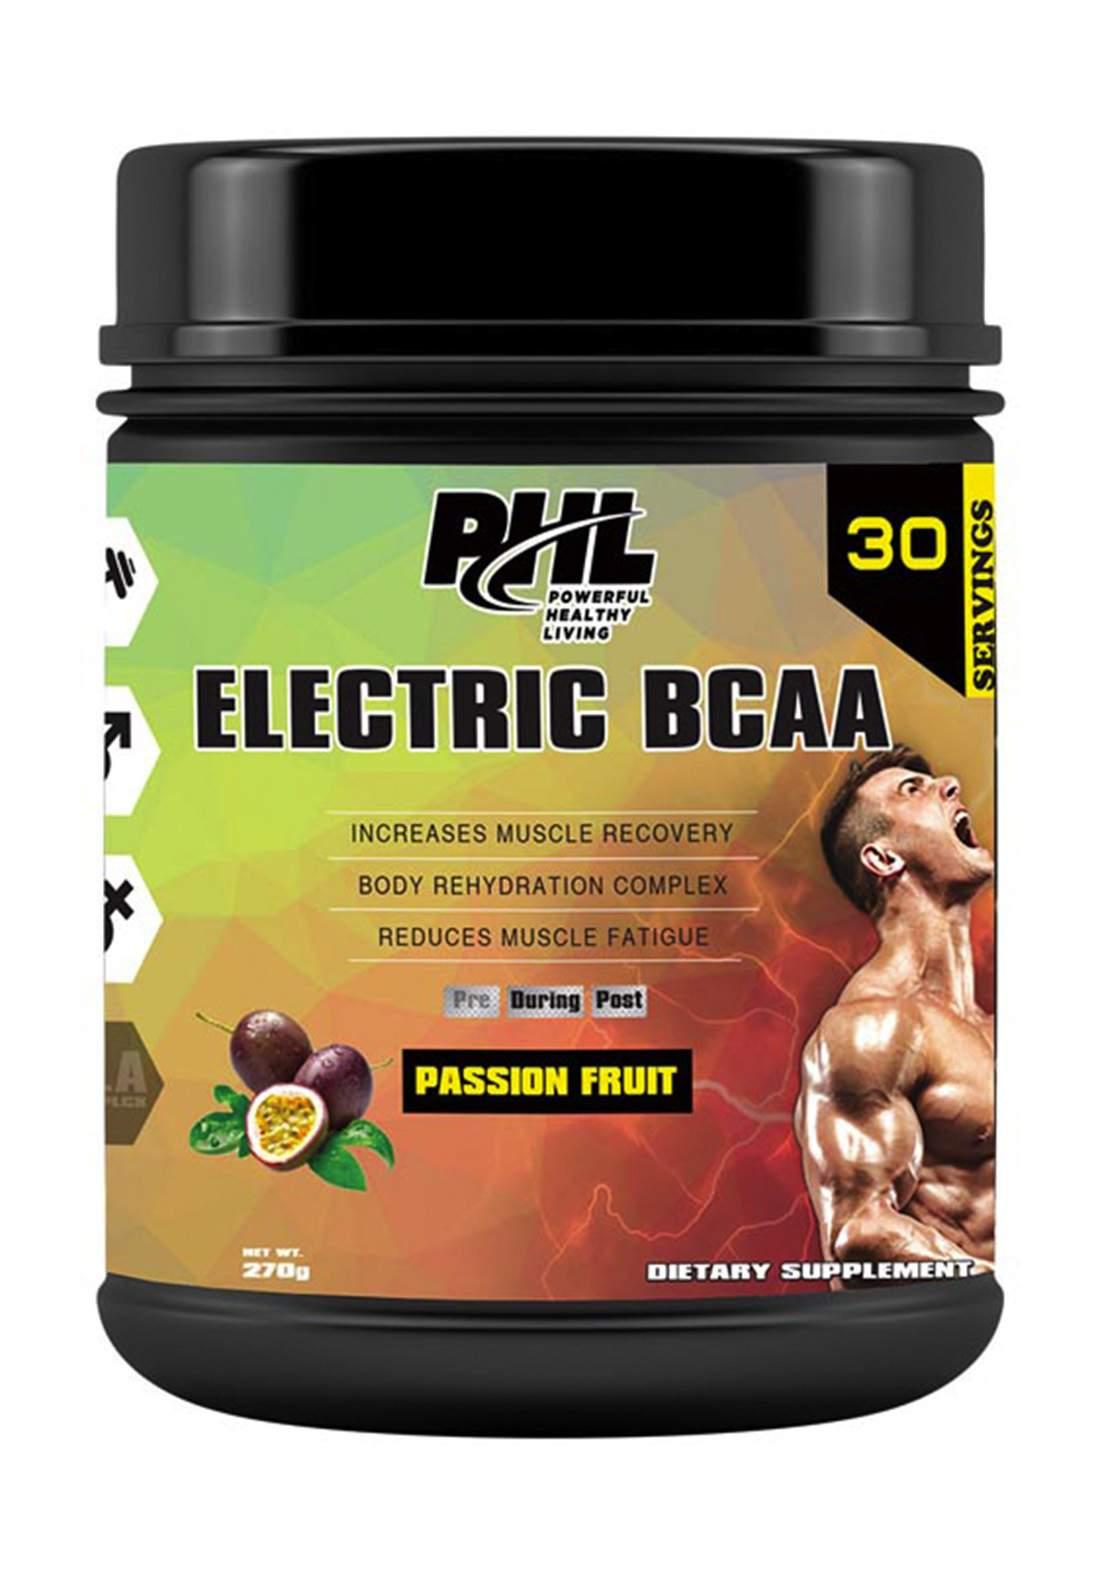 Phl electric Bcaa Powder Passion Fruit 30 Servings 270gm مكمل غذائي